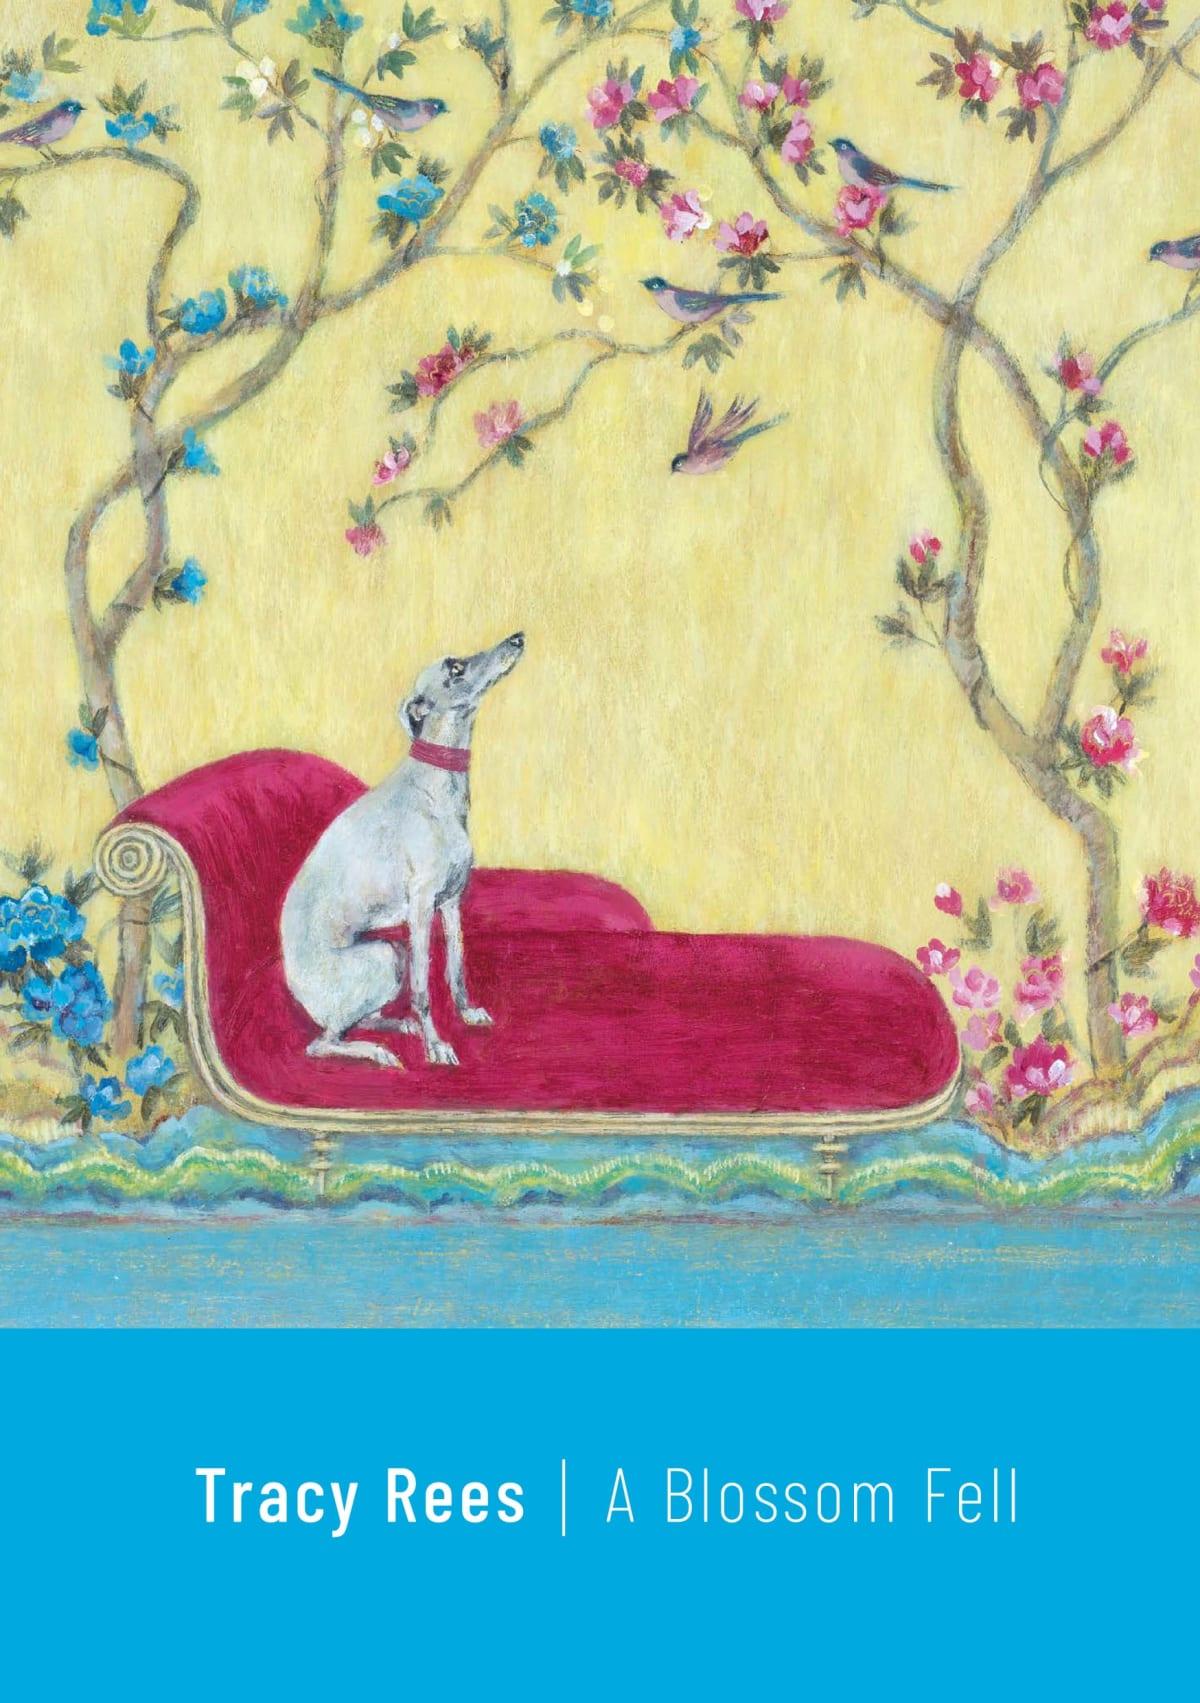 Tracy Rees: A Blossom Fell